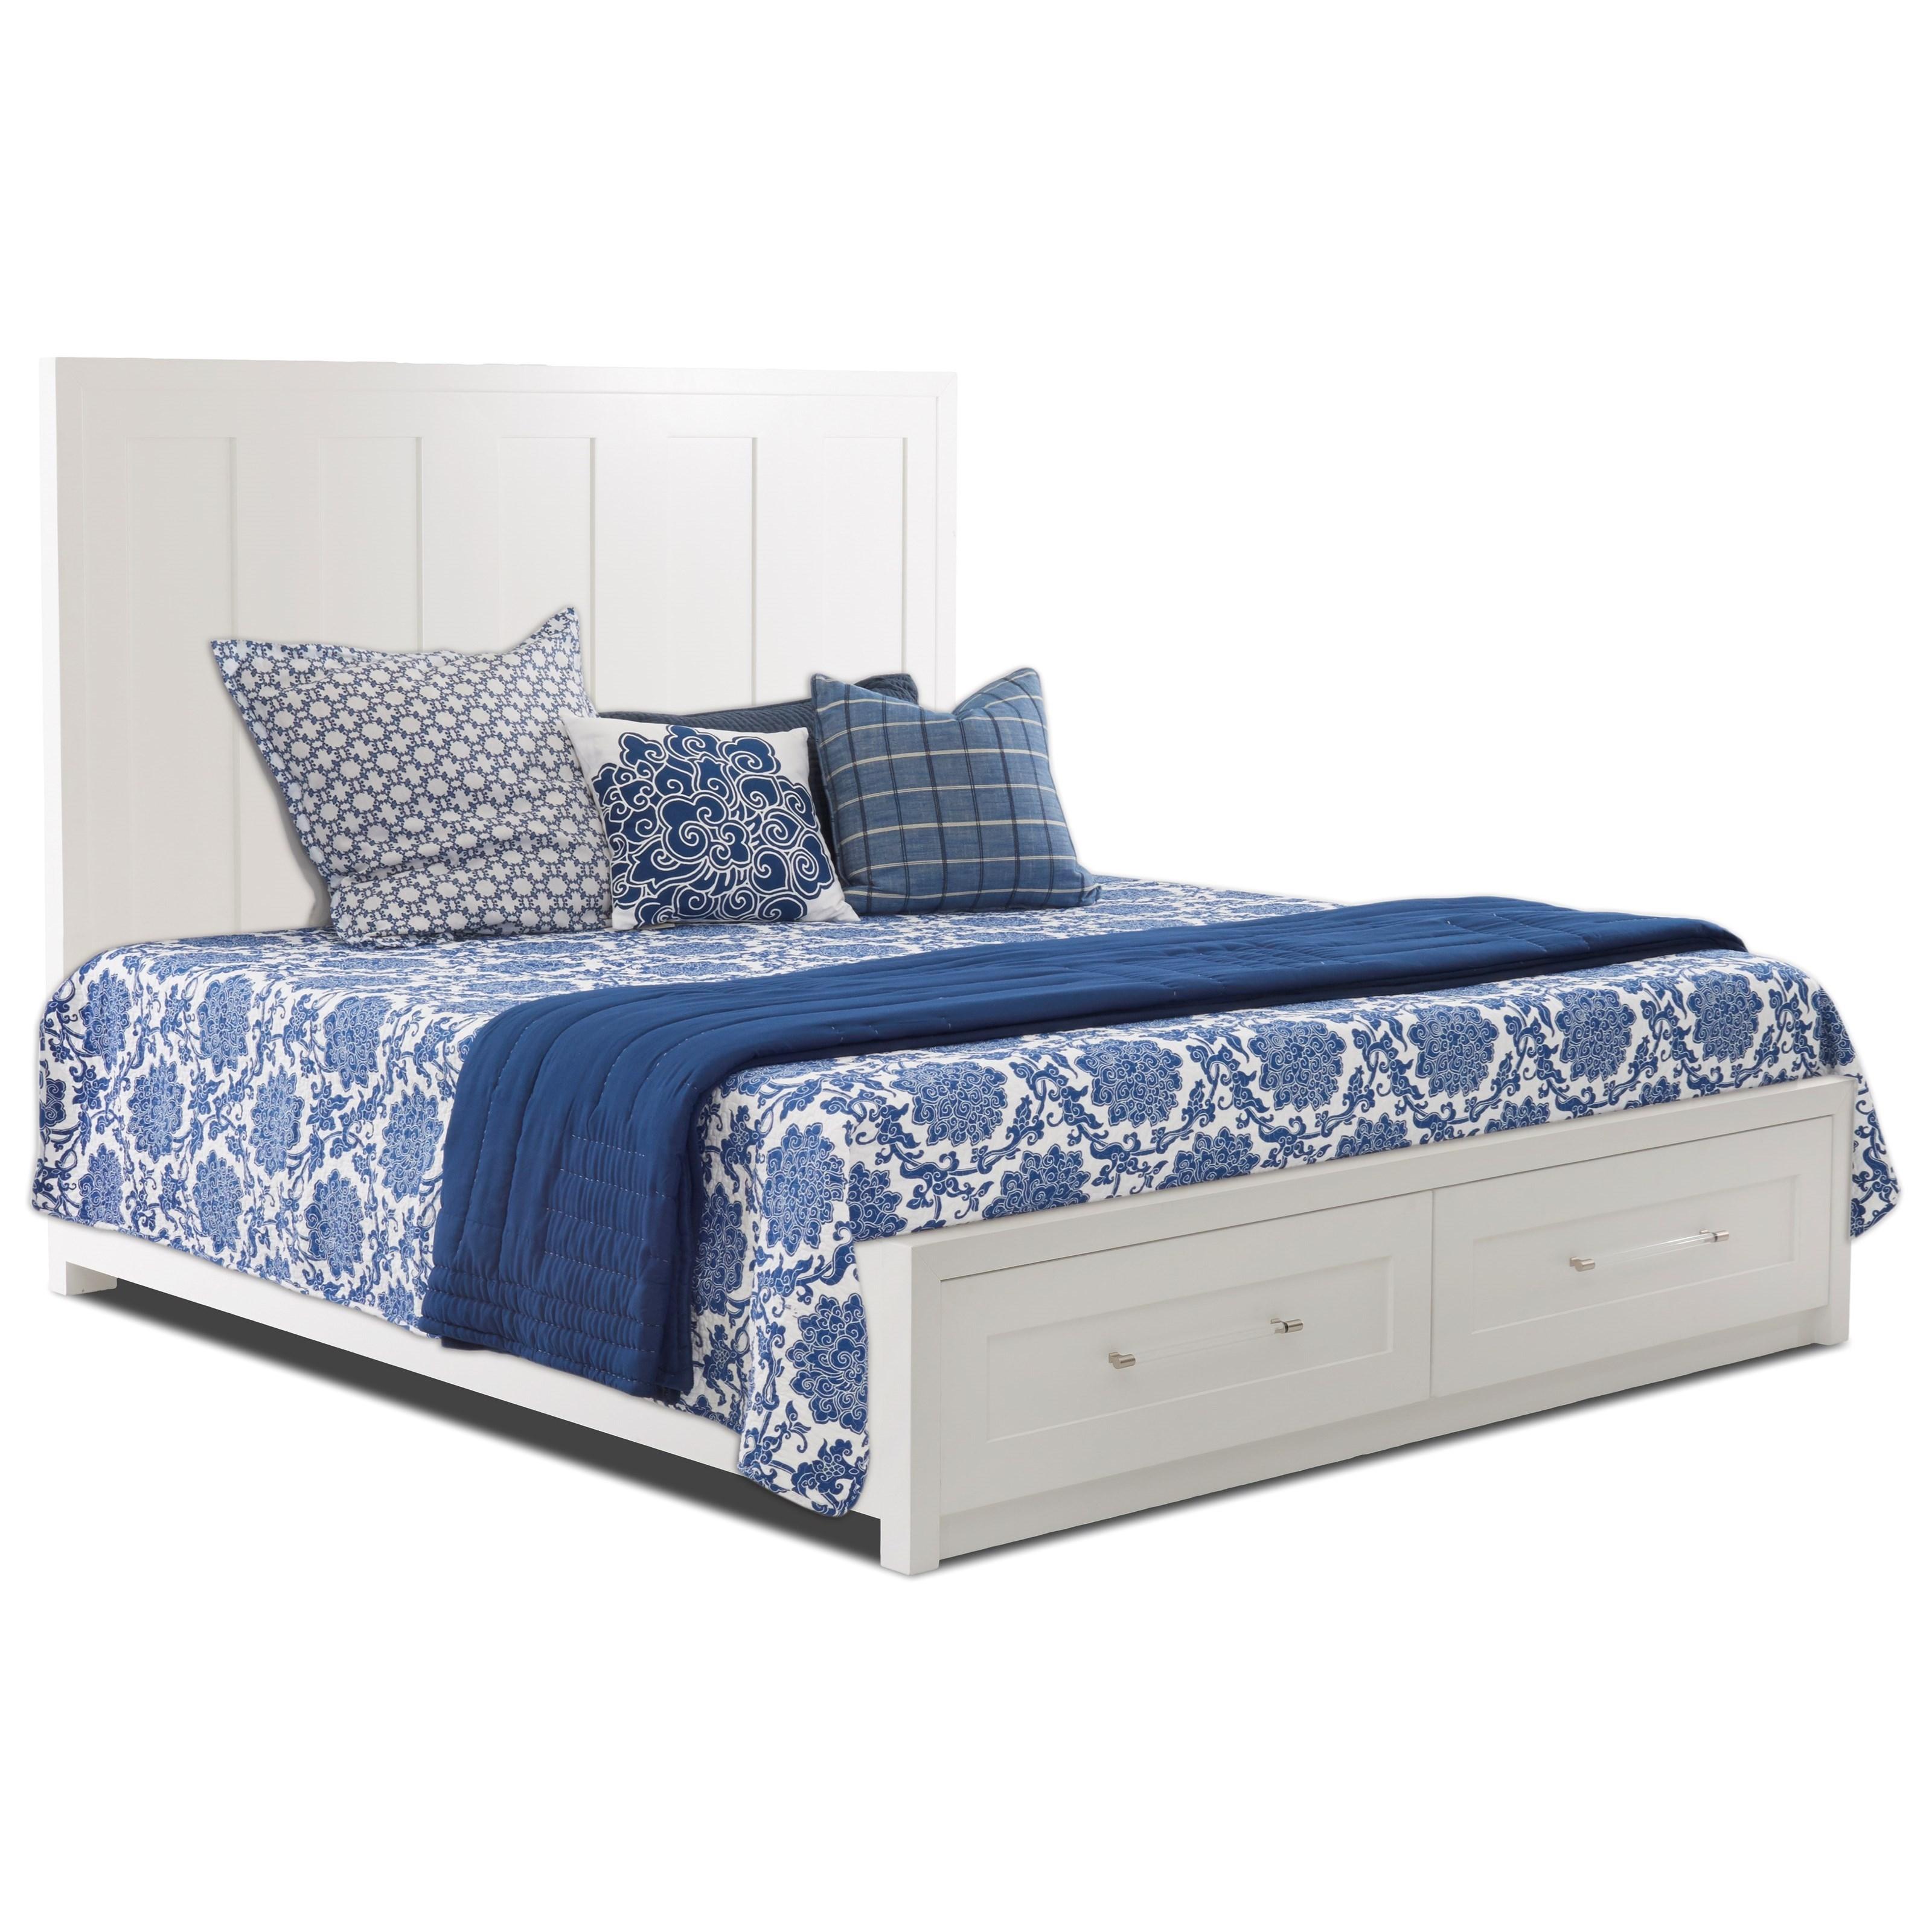 Queen Bed  w/ Storage Complete